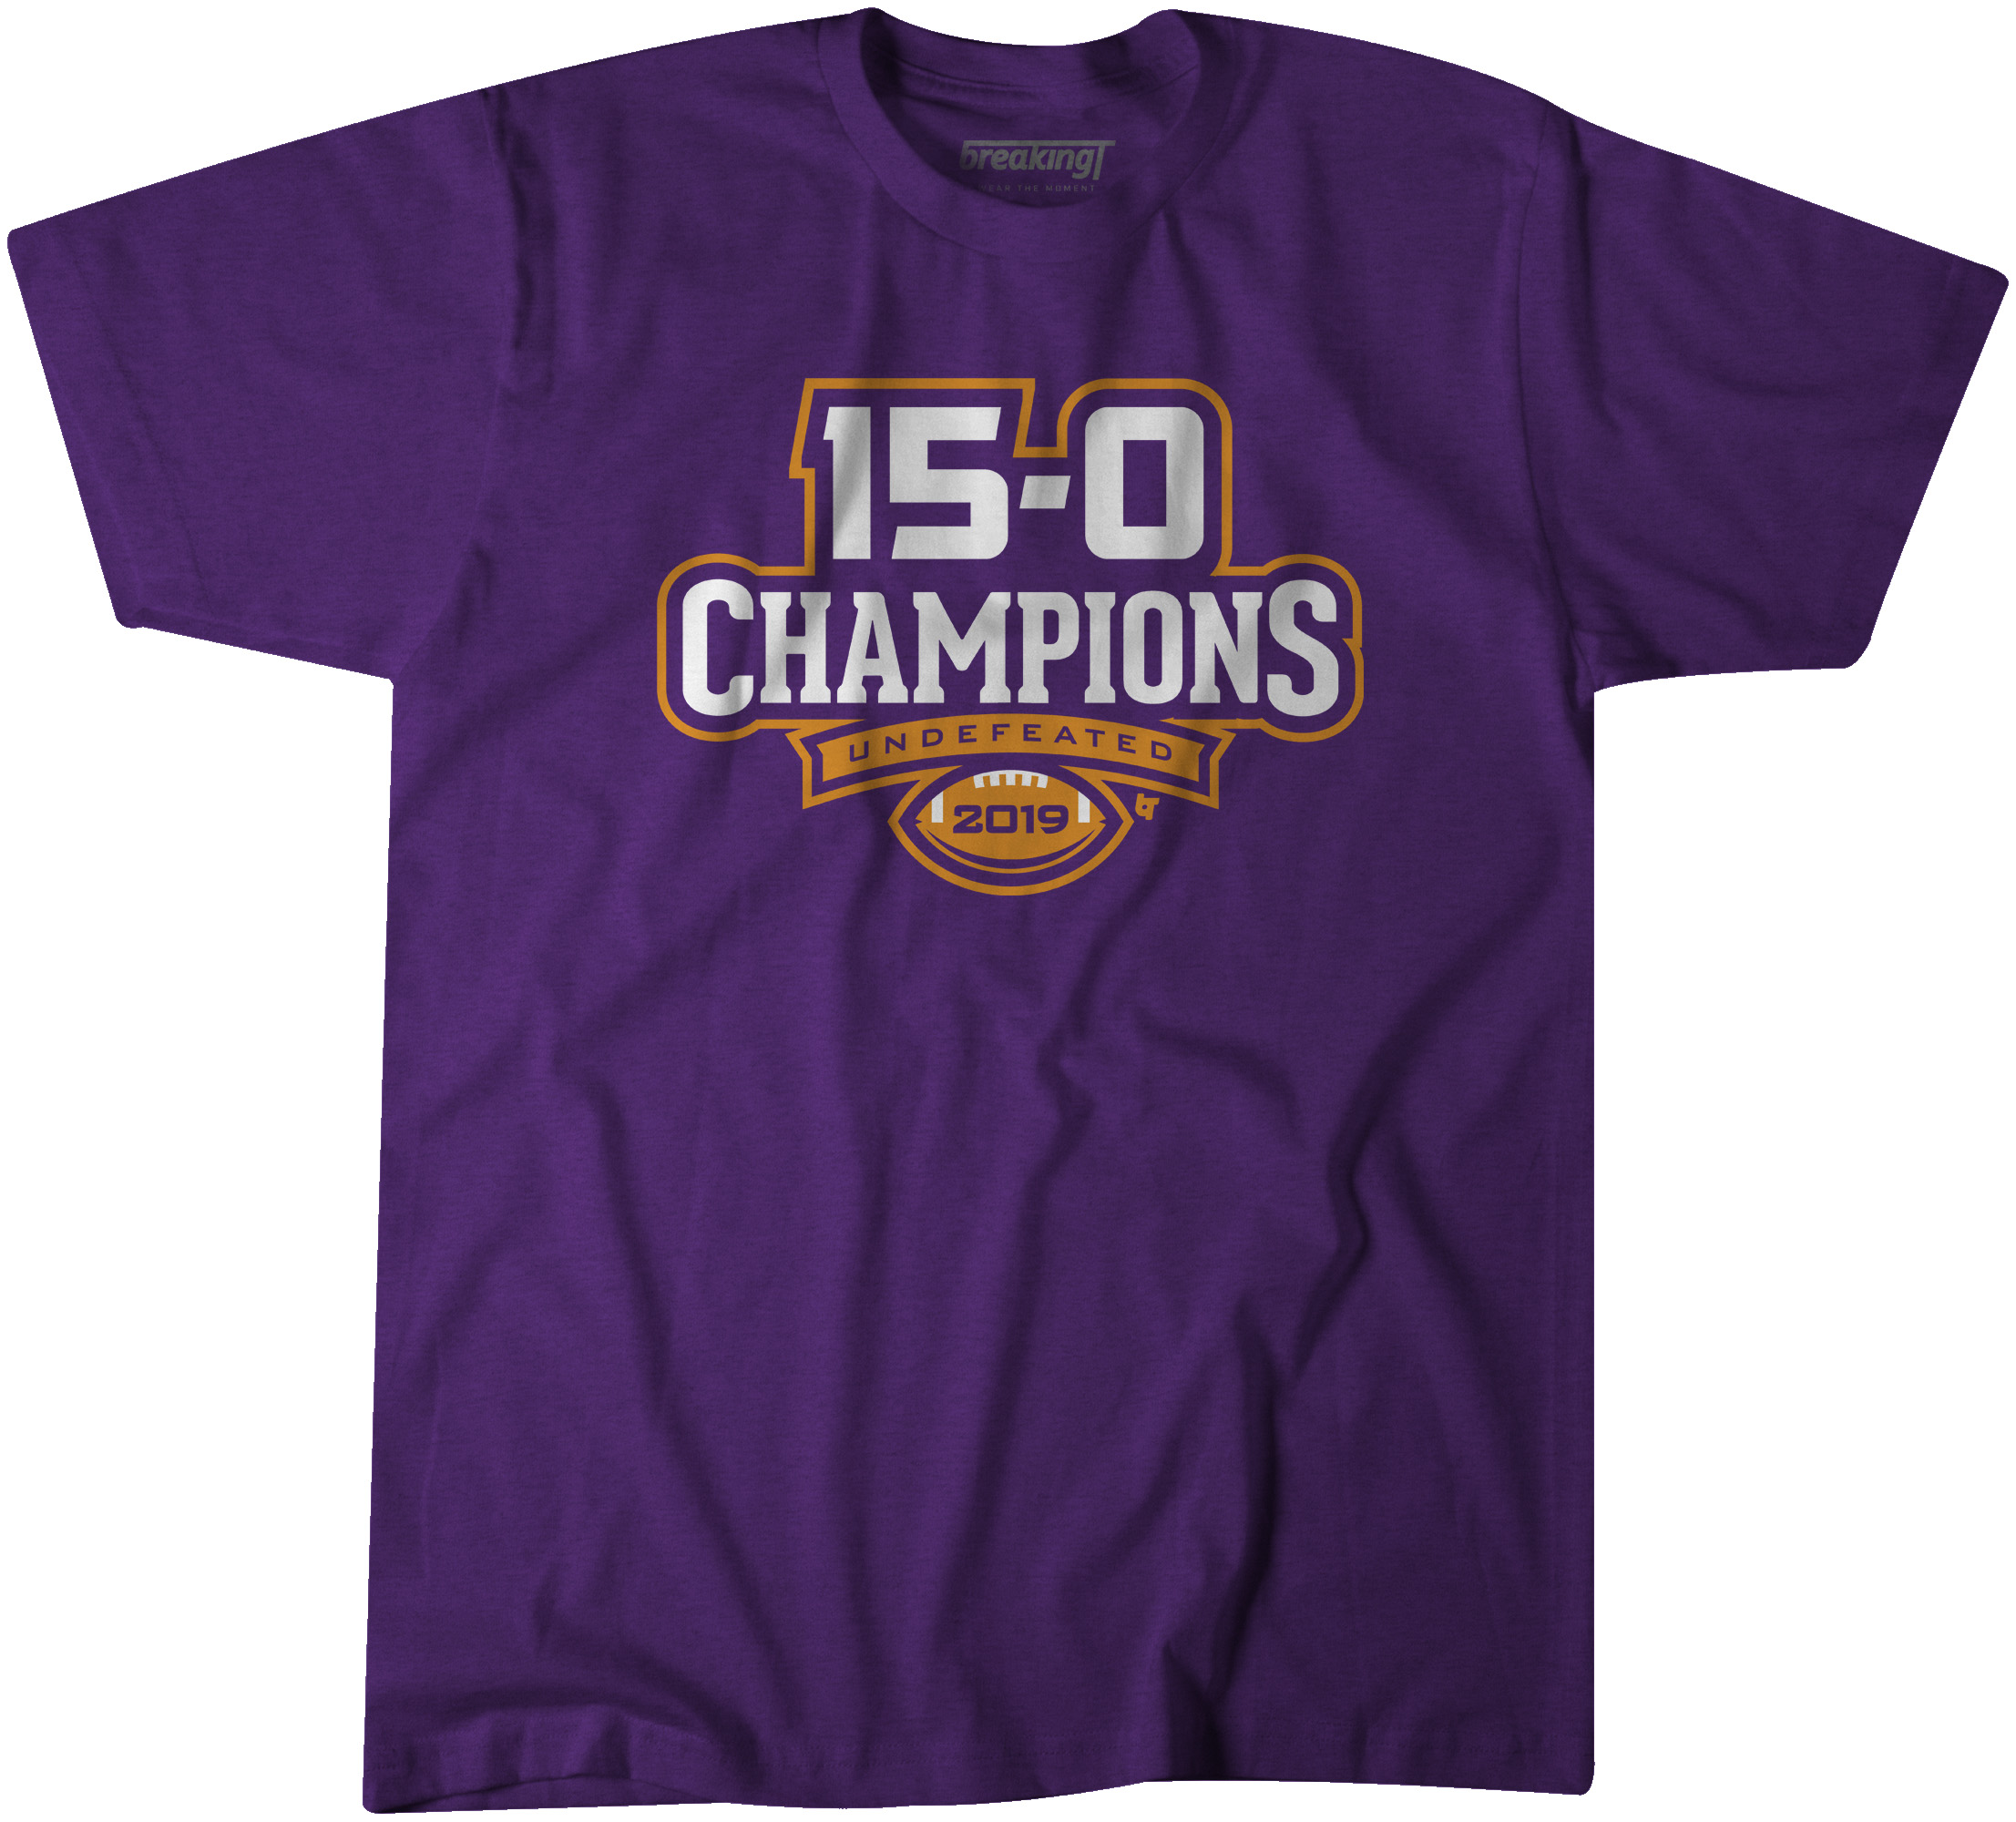 89c8d7838 15-0 Champs T-shirt for  25 BreakingT